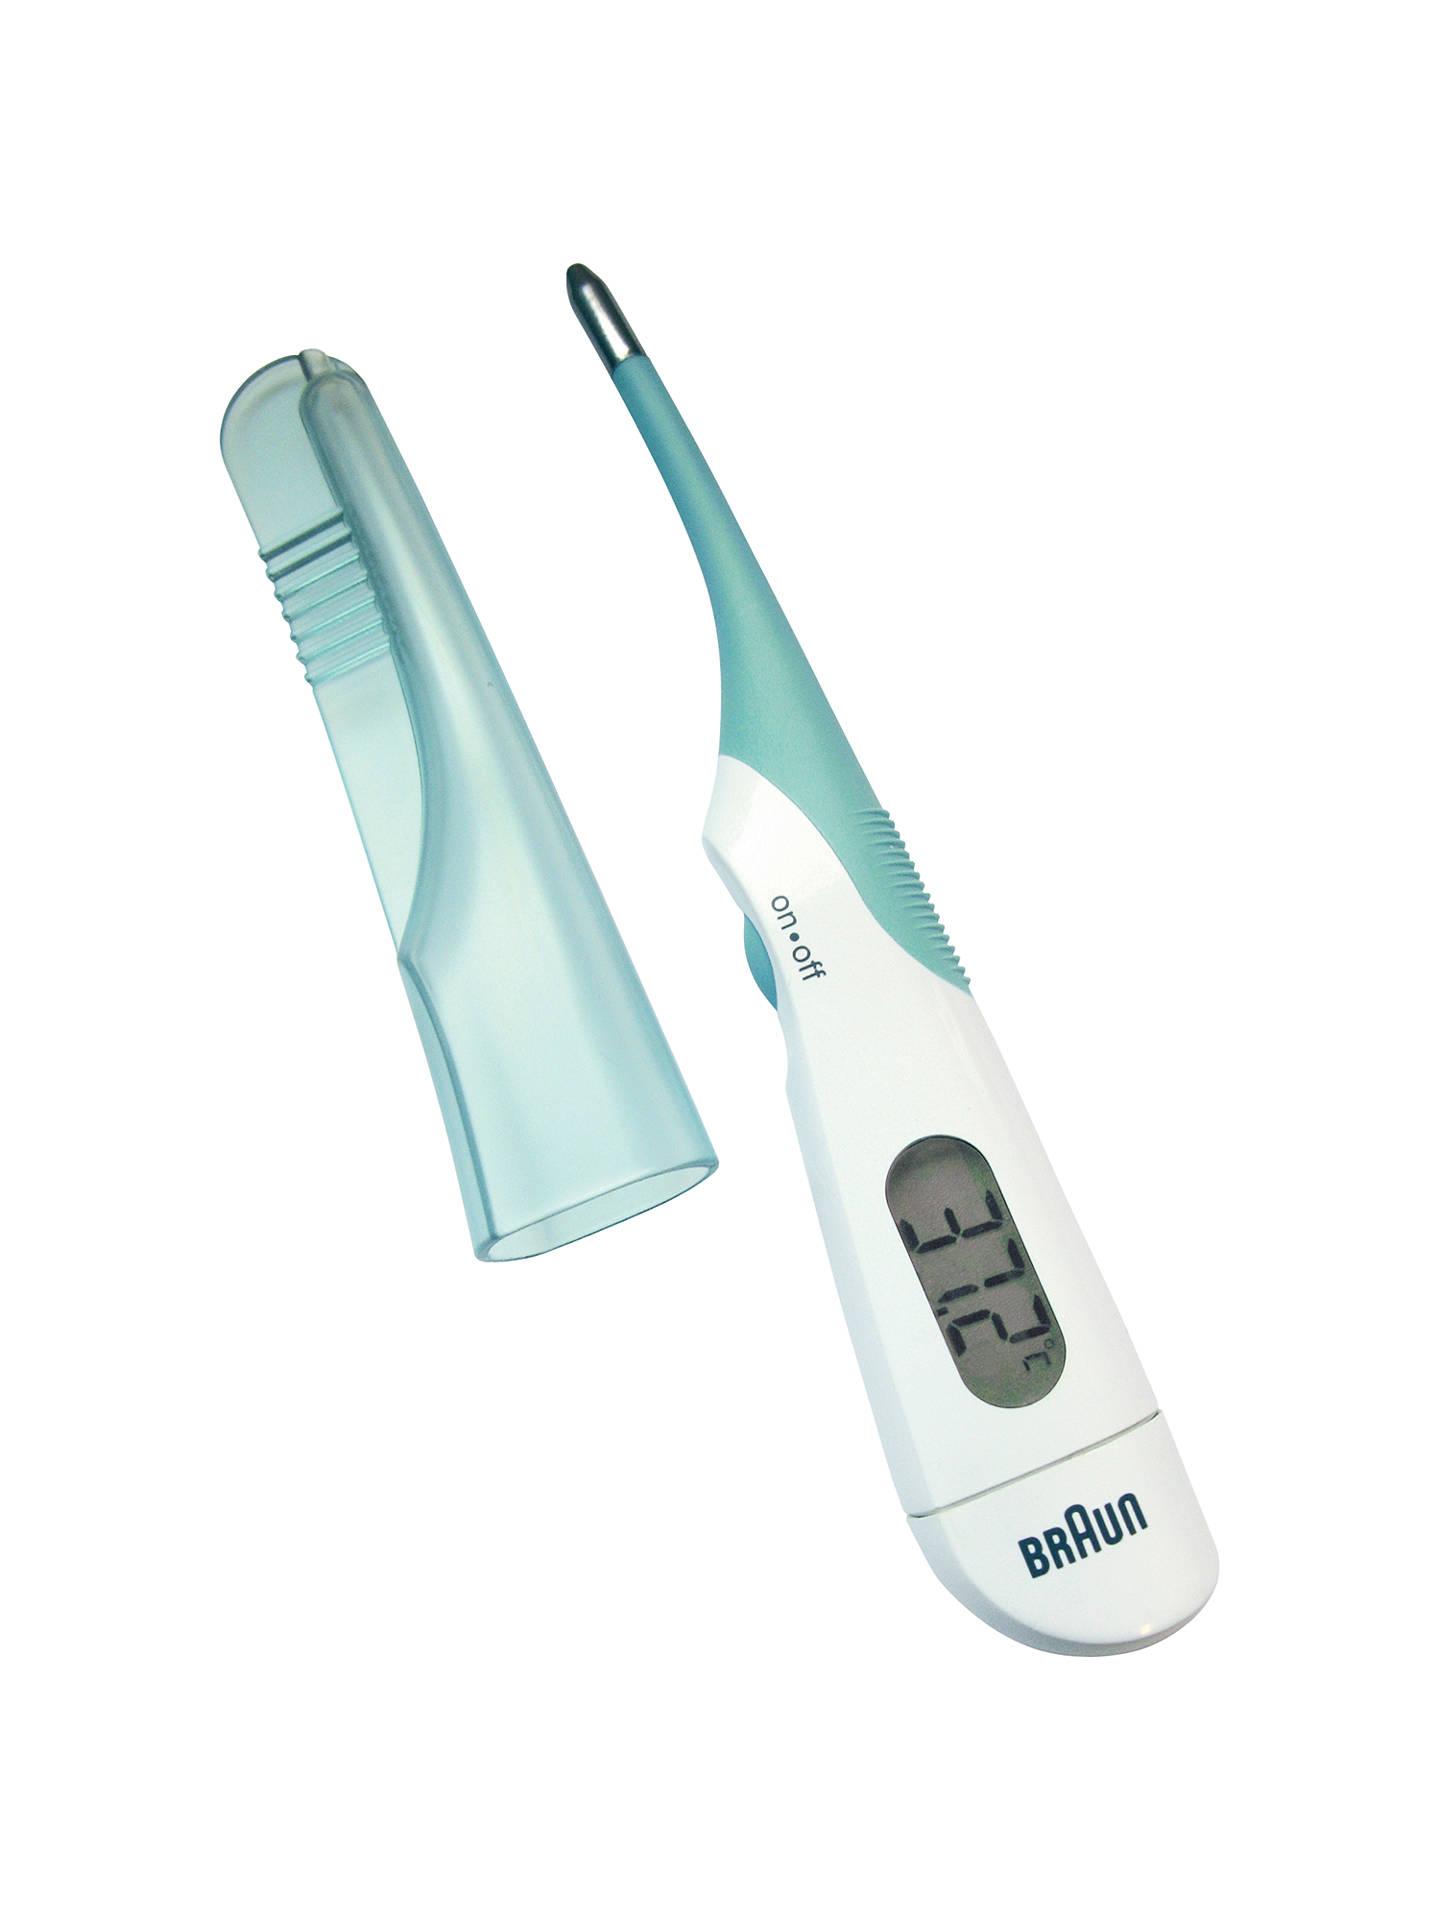 BuyBraun PRT1000 High Speed 3 in 1 Thermometer Online at johnlewis.com 43976ebb7ddae